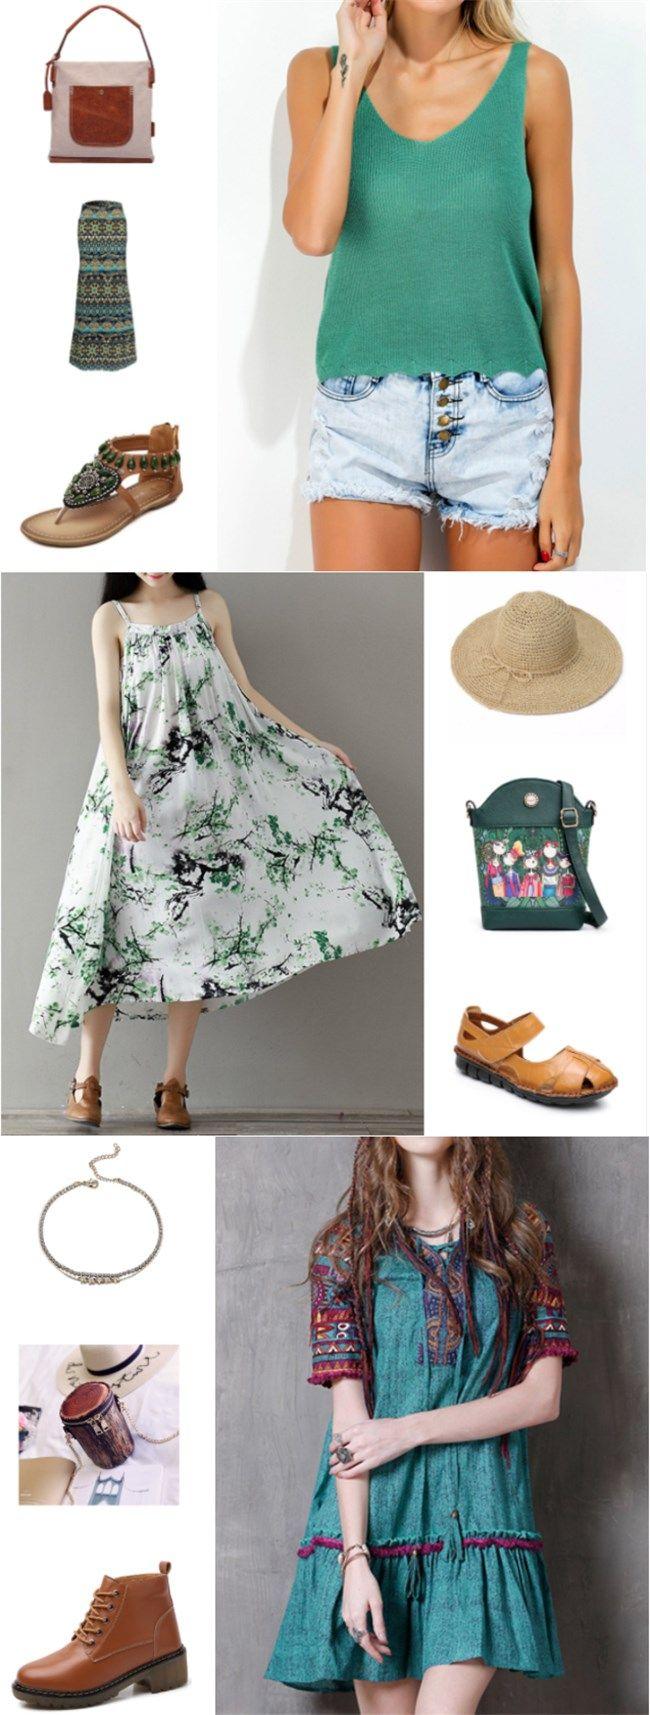 #green#flora l& mori # Indian style#retro look  special retro vest +printed loose dress+  Dr Martens boots+boho sandals+summer hat